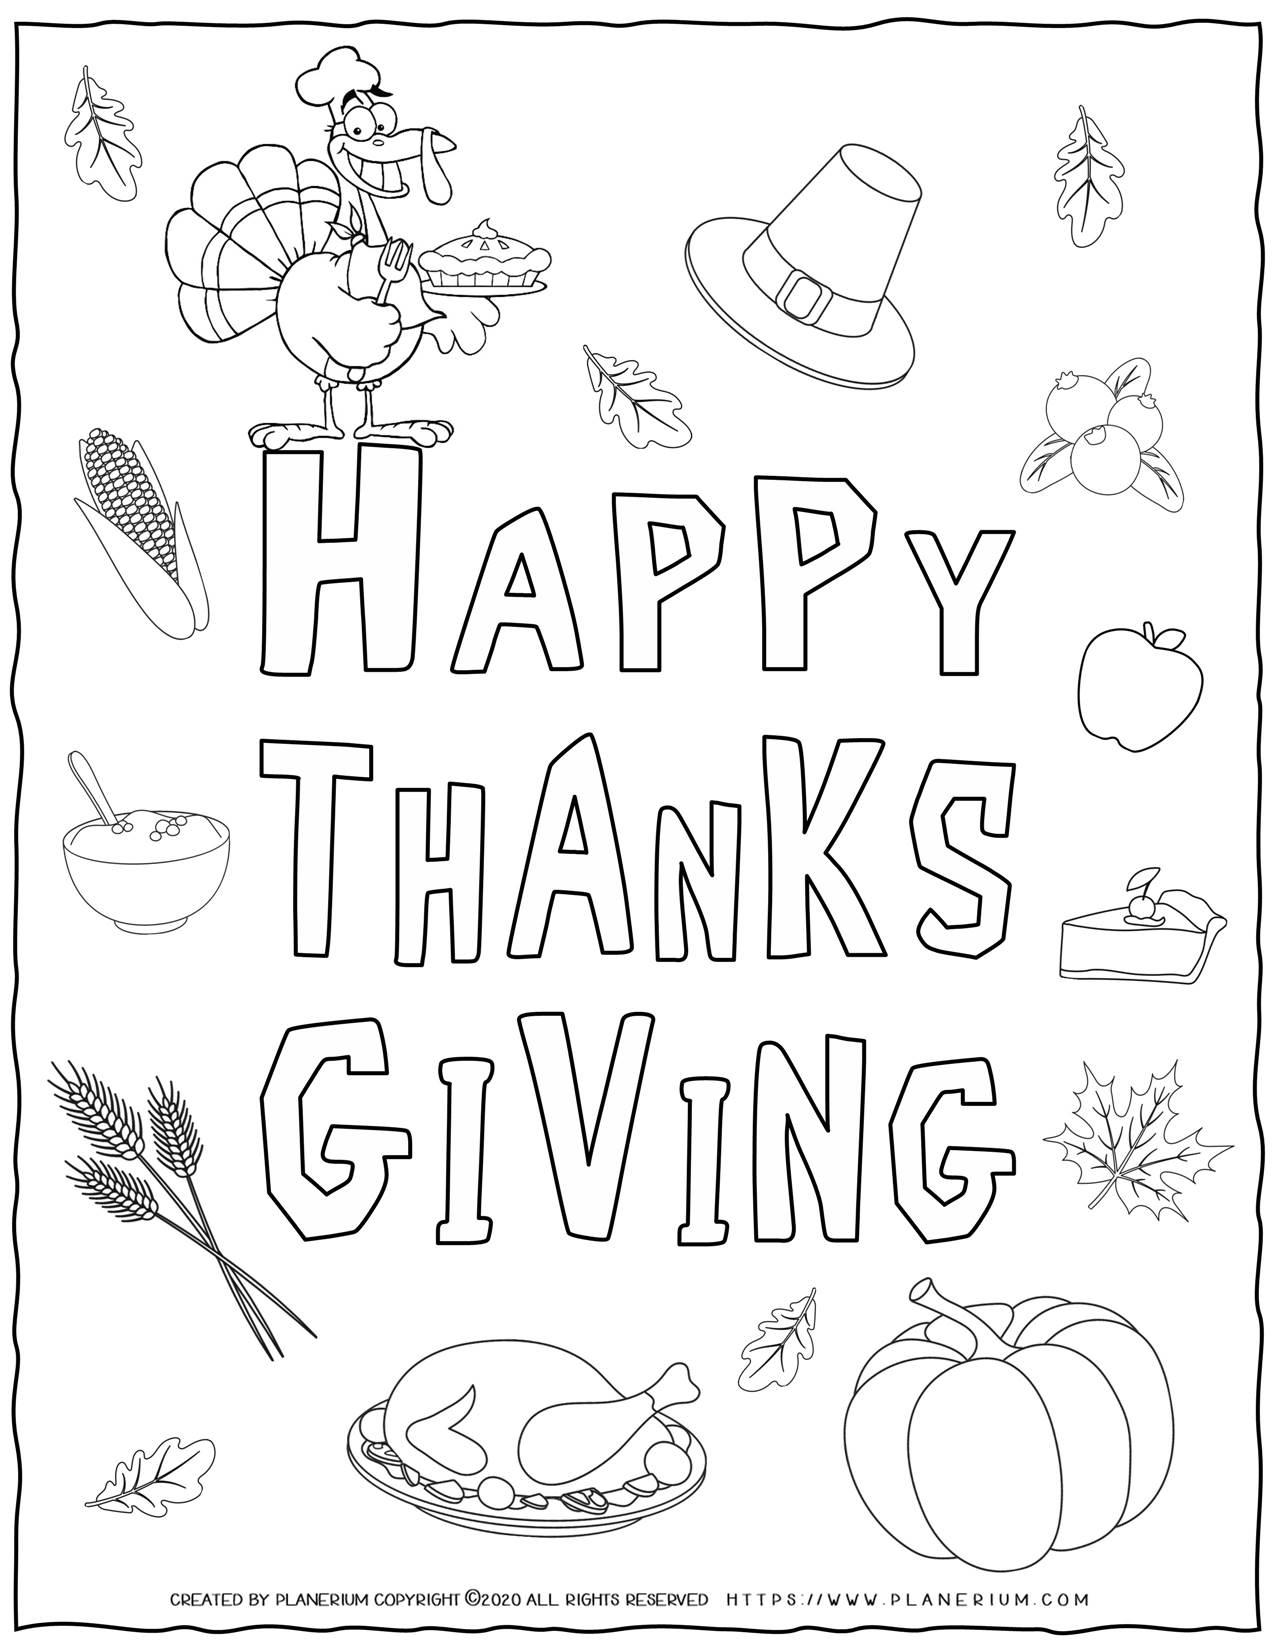 Happy Thanksgiving Symbols - Coloring Page | Planerium